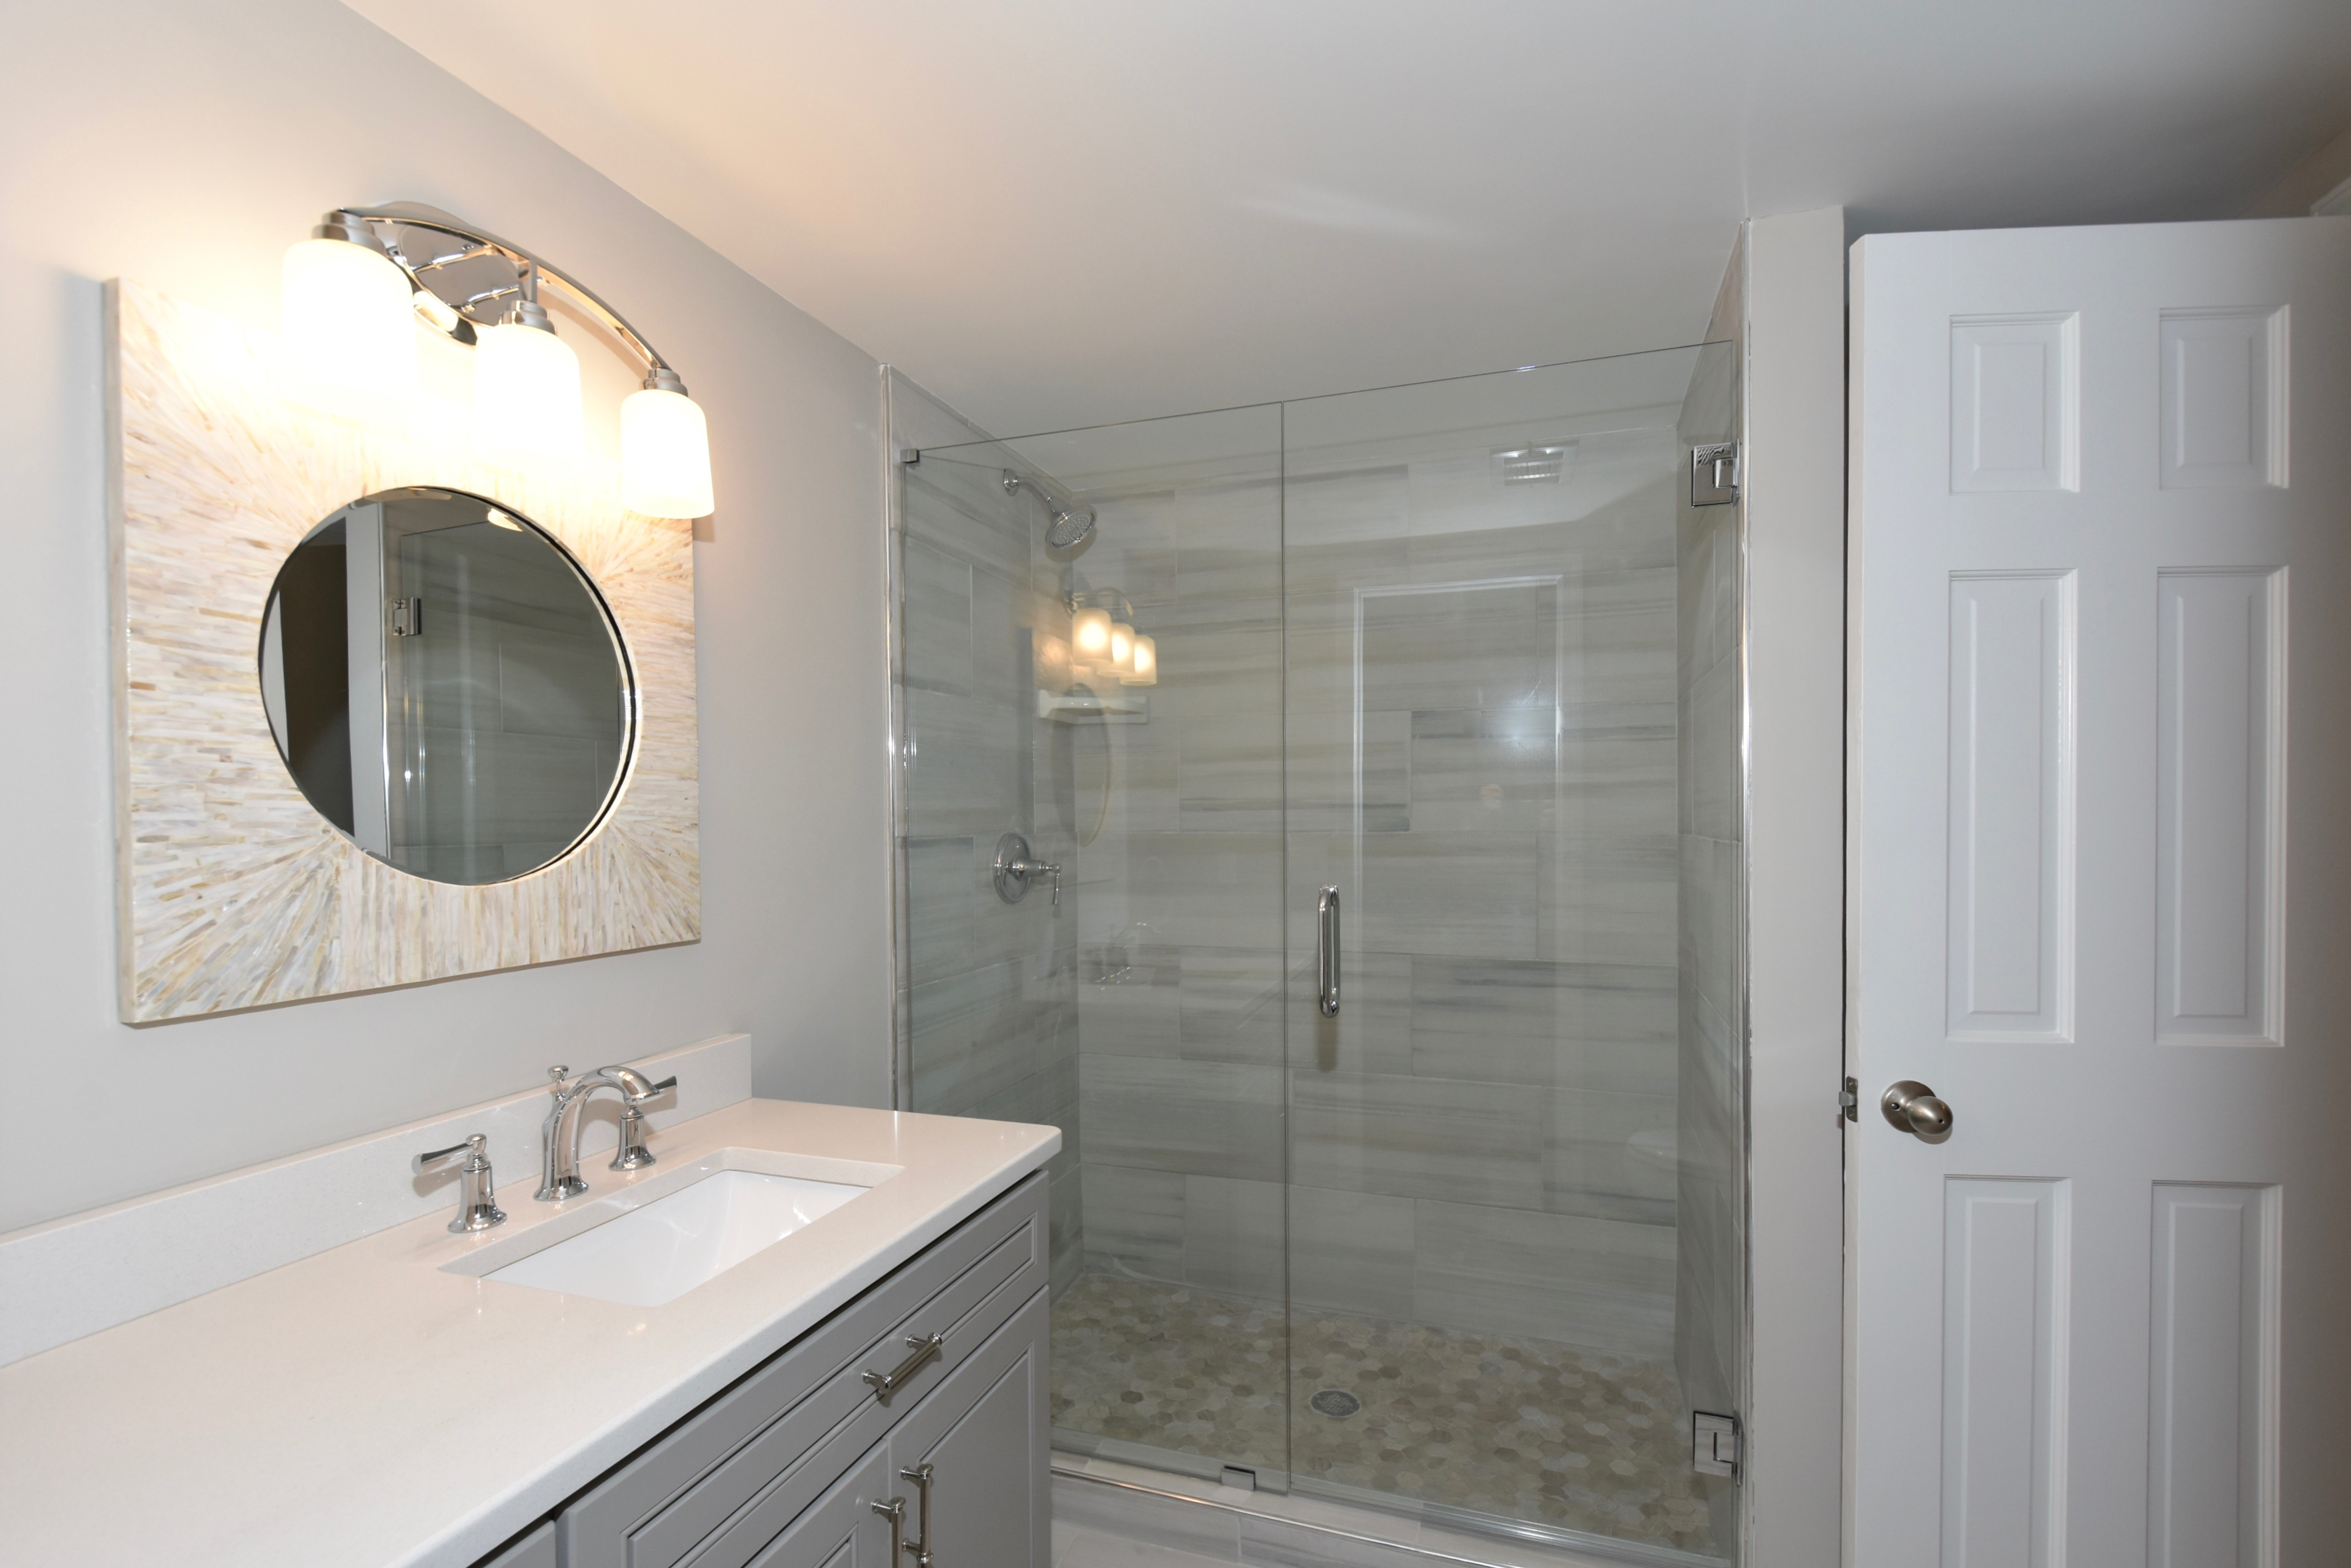 wc bath basement williammark designs. Black Bedroom Furniture Sets. Home Design Ideas